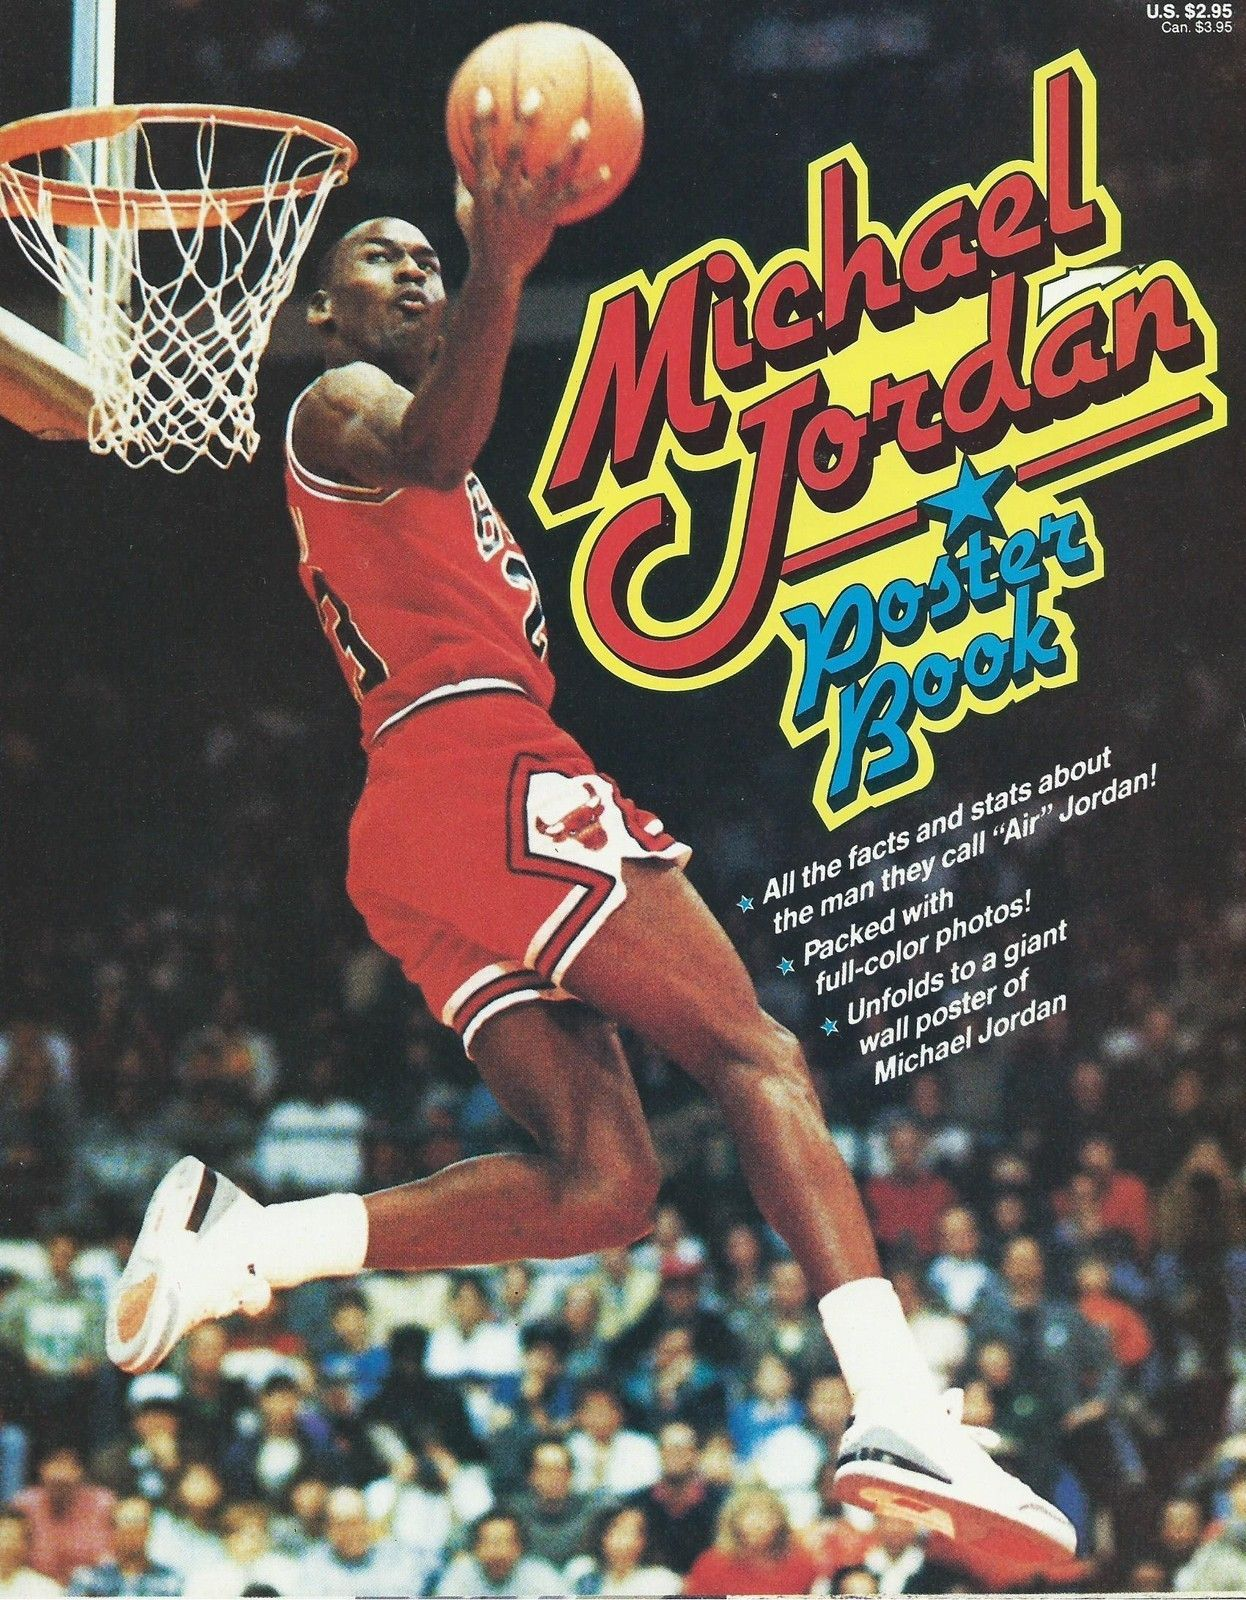 michael jordan poster book rare 8 pages 22x34 wall dunk bull